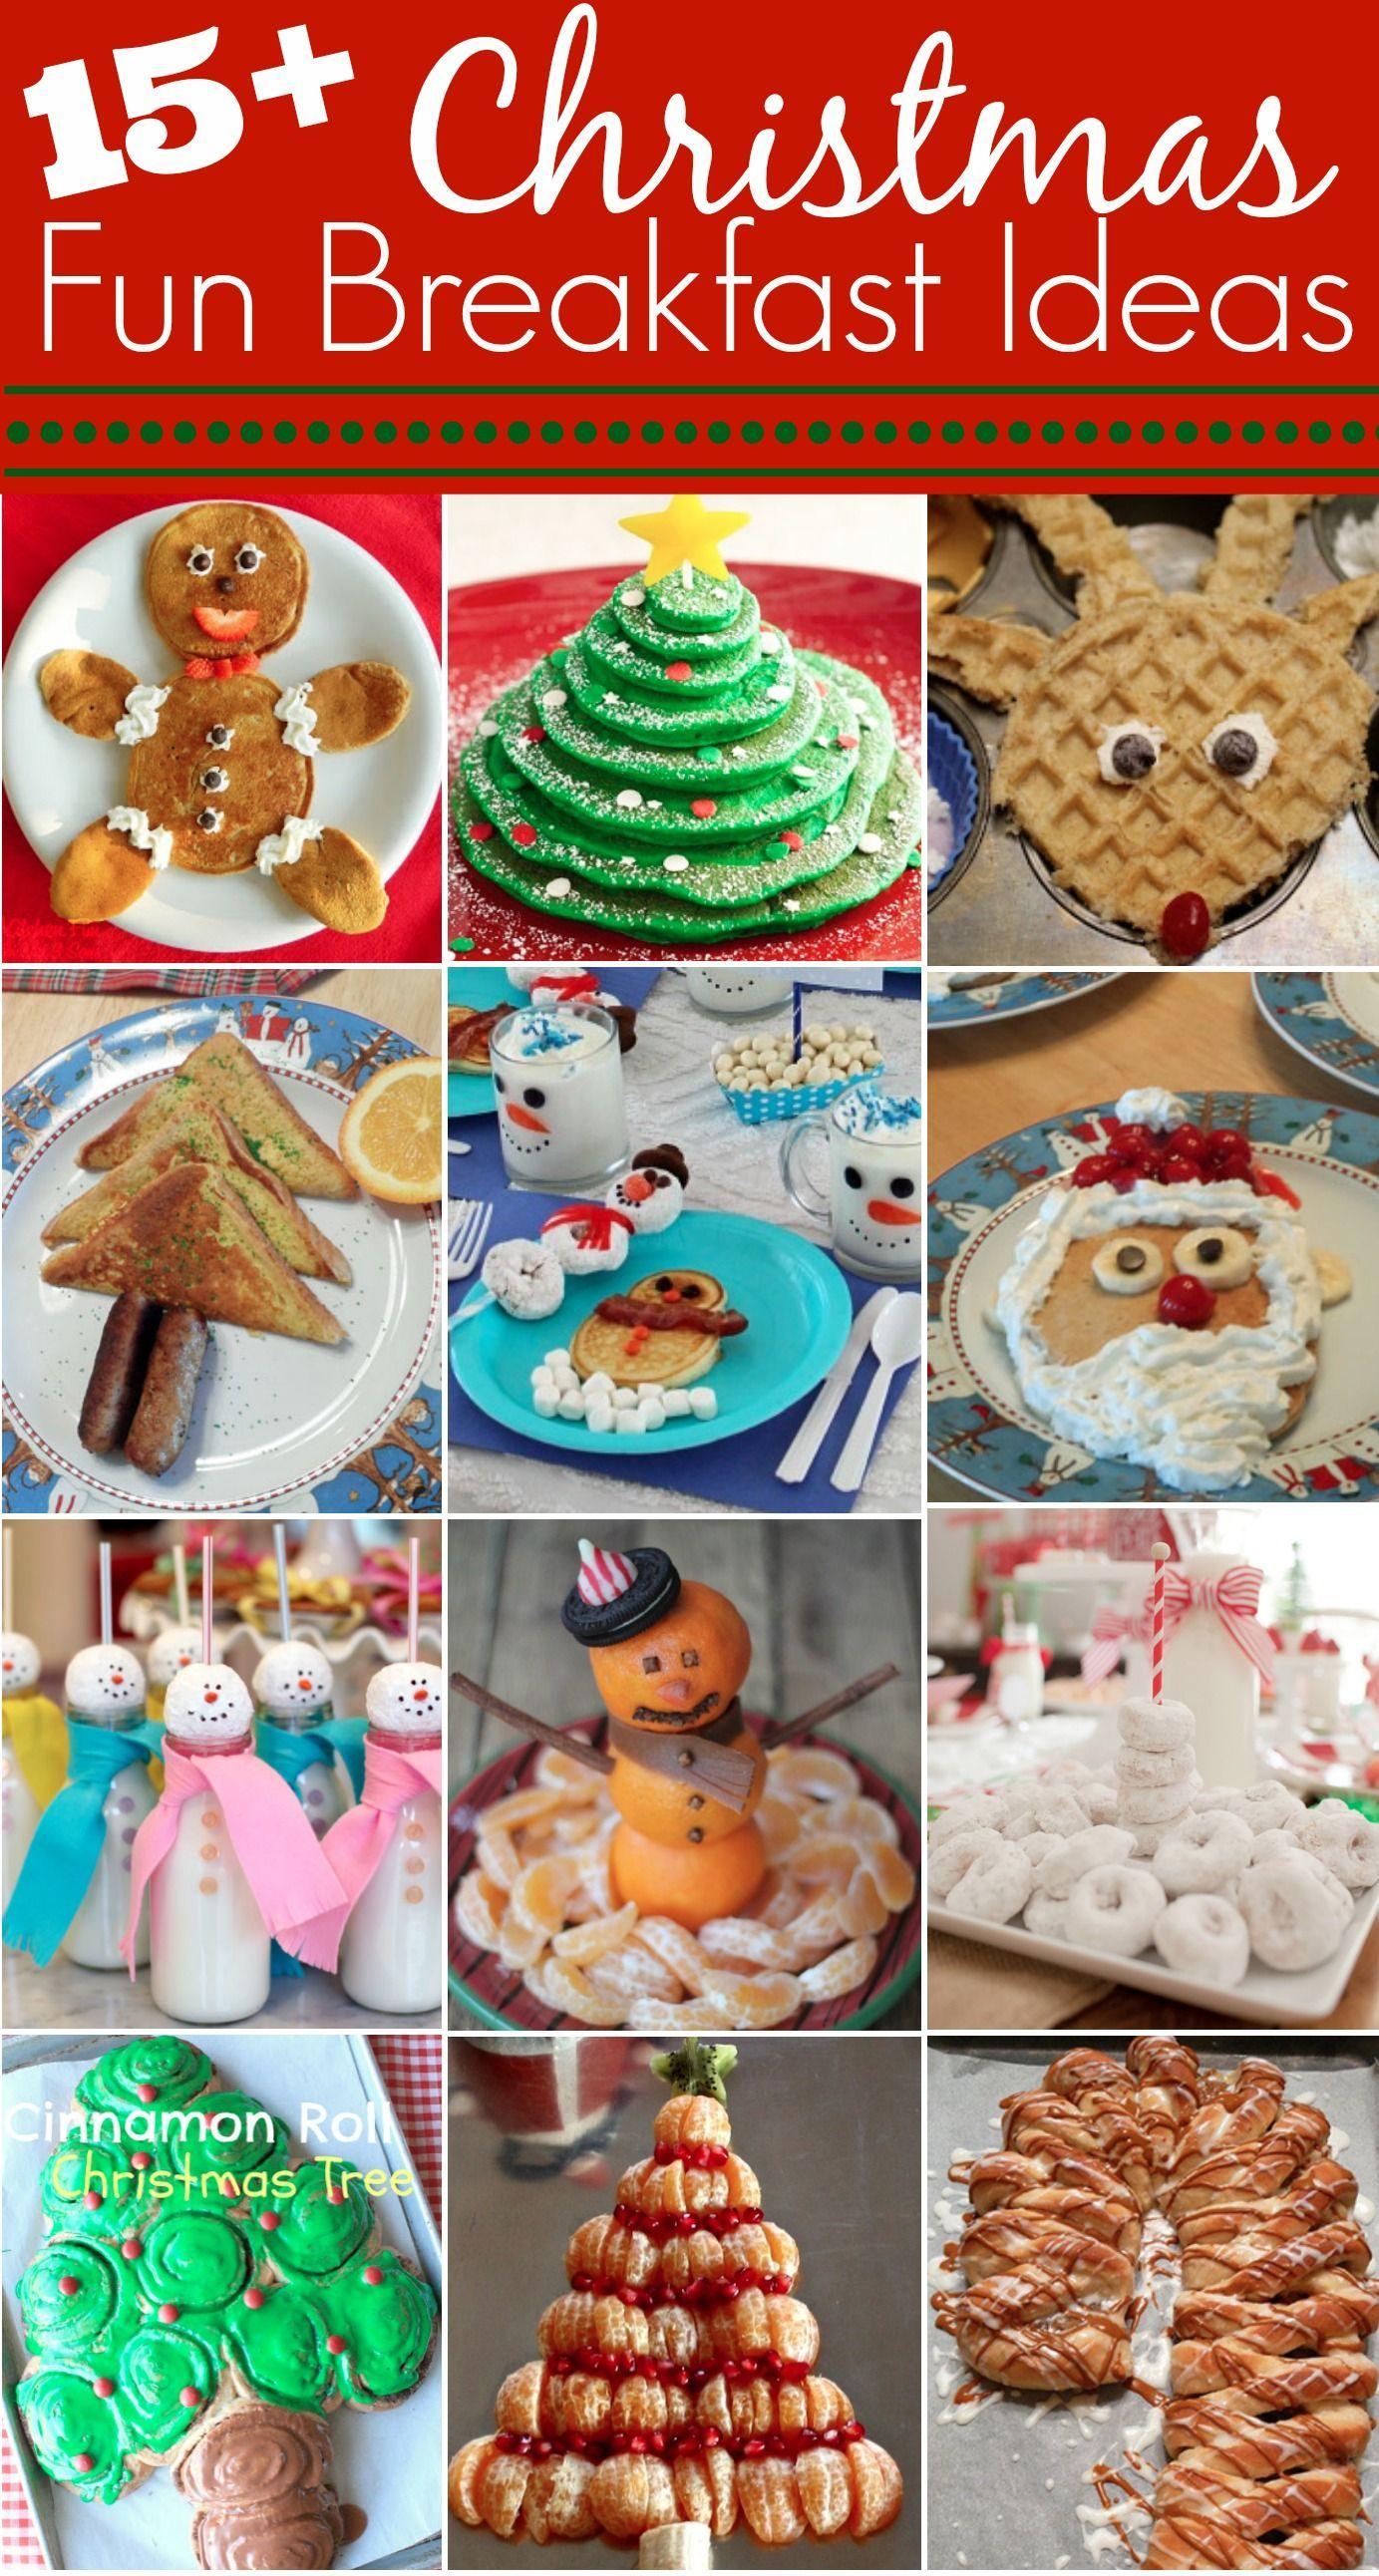 Christmas Breakfast Ideas 2020 15+ Fun Christmas Breakfast Ideas   Mom Endeavors   15+ fun